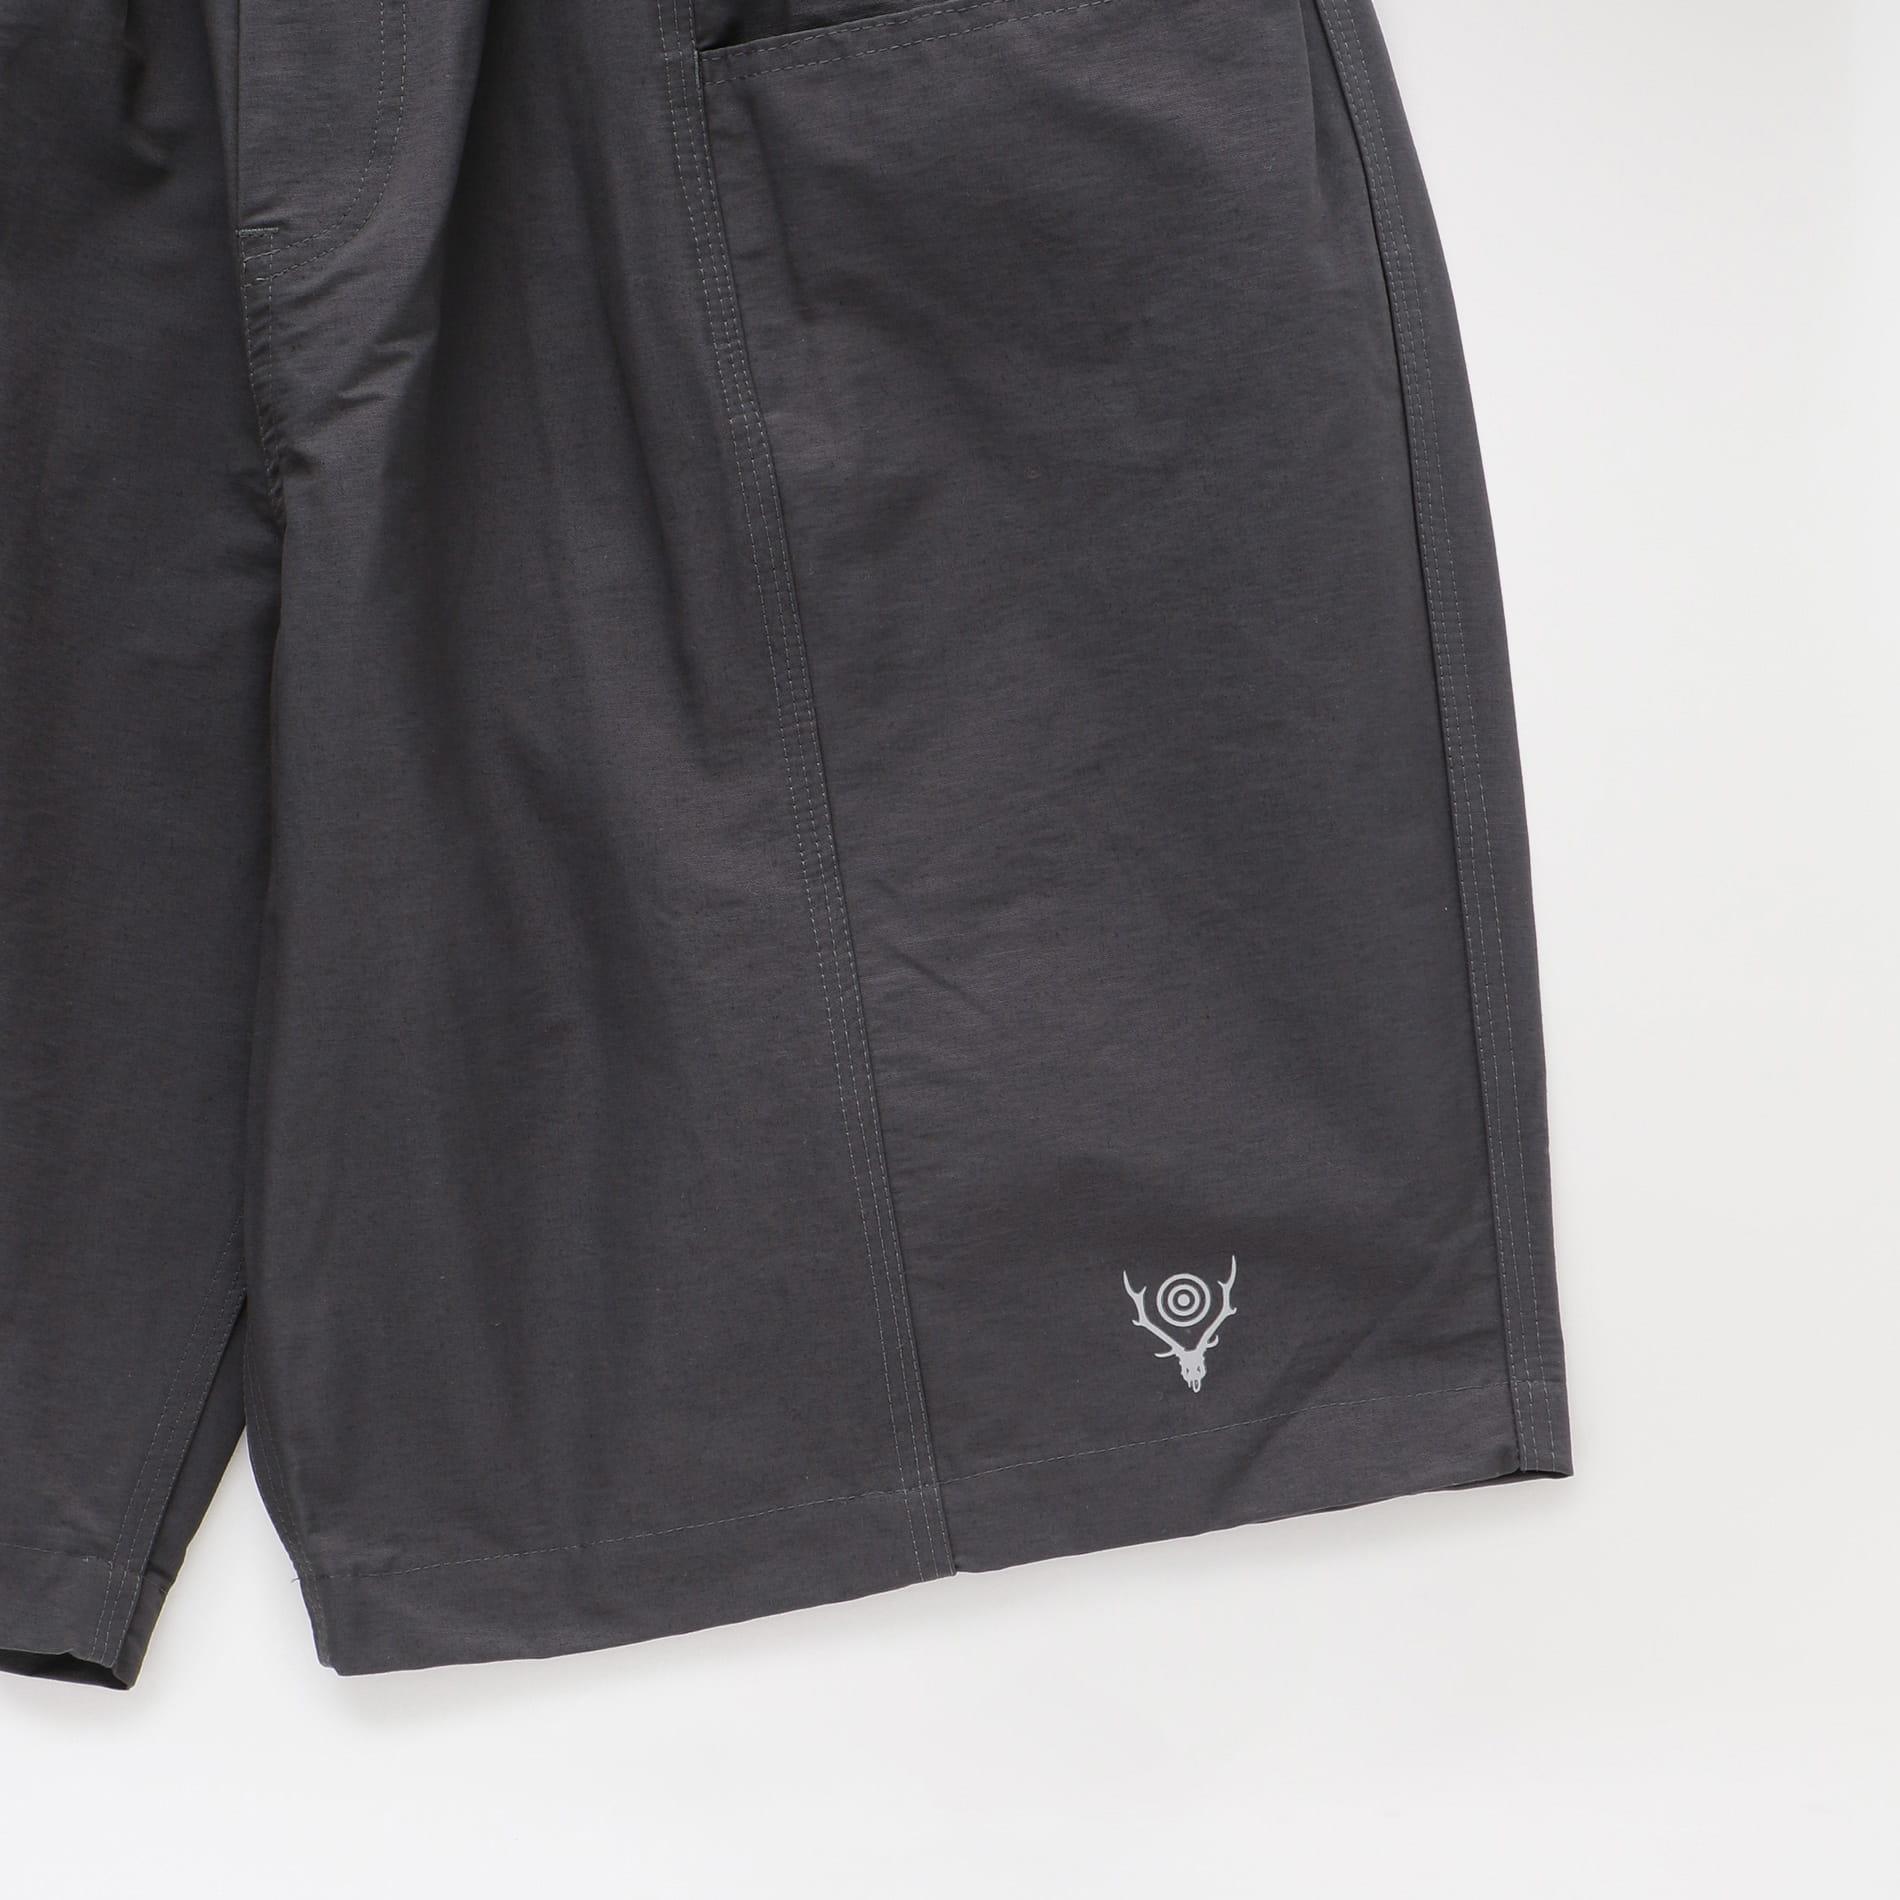 【South2 West8】MEN ショートパンツ Belted C.S. Short - C/N Grosgrain IN792